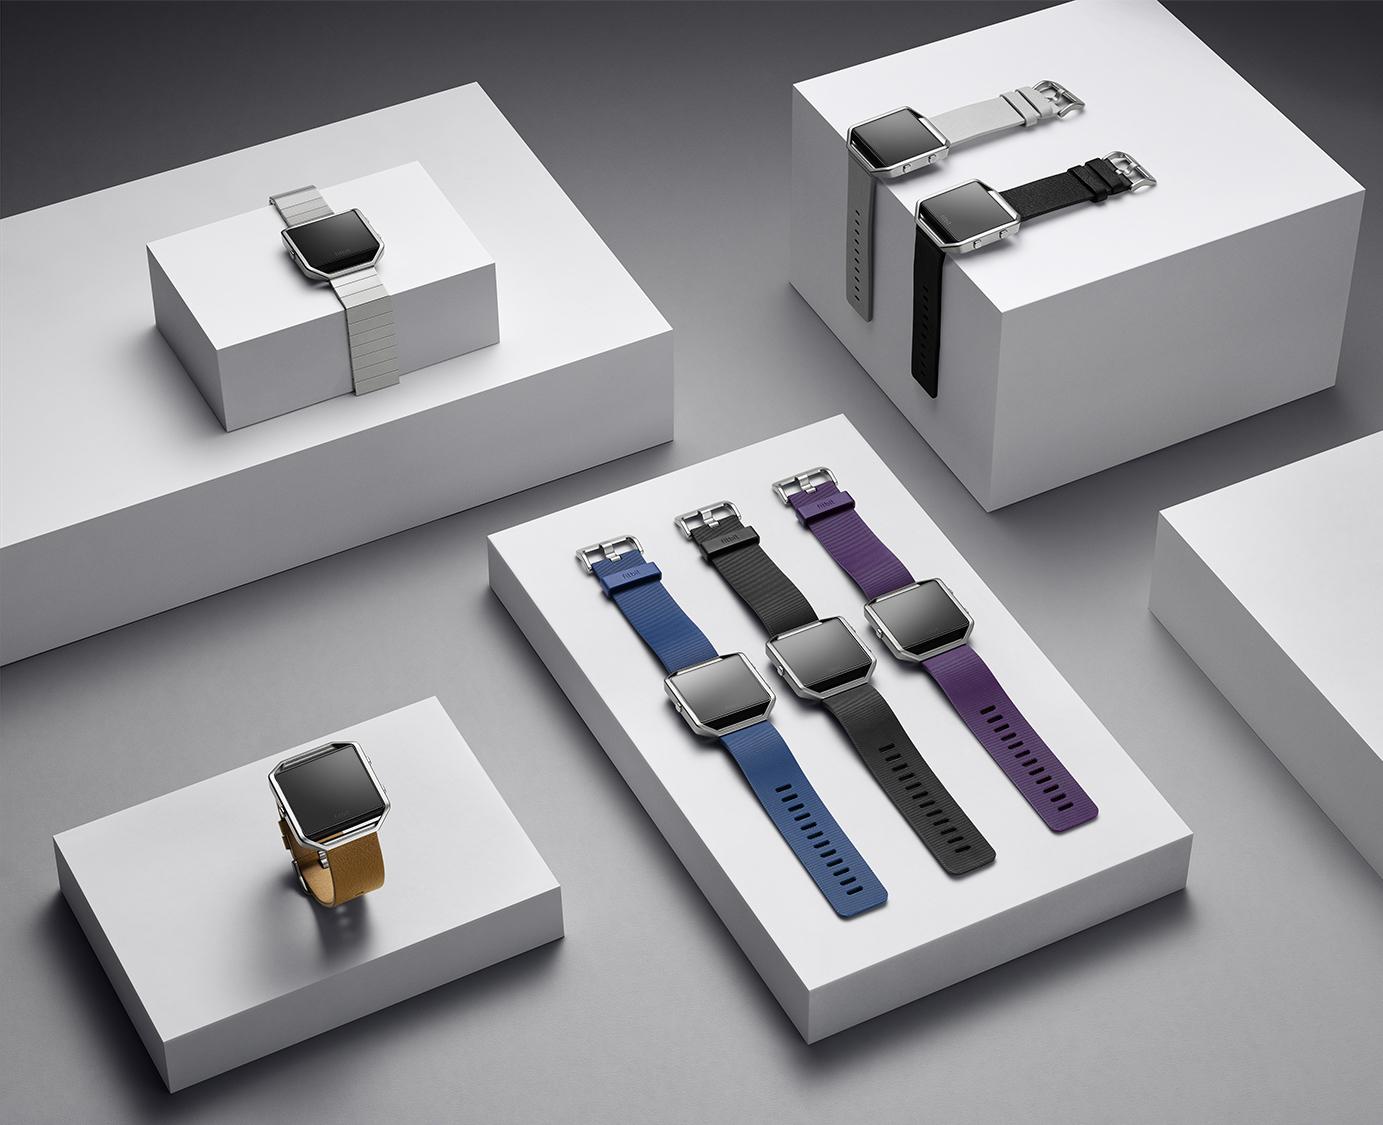 Det kommer nye Fitbit-produkter i år.